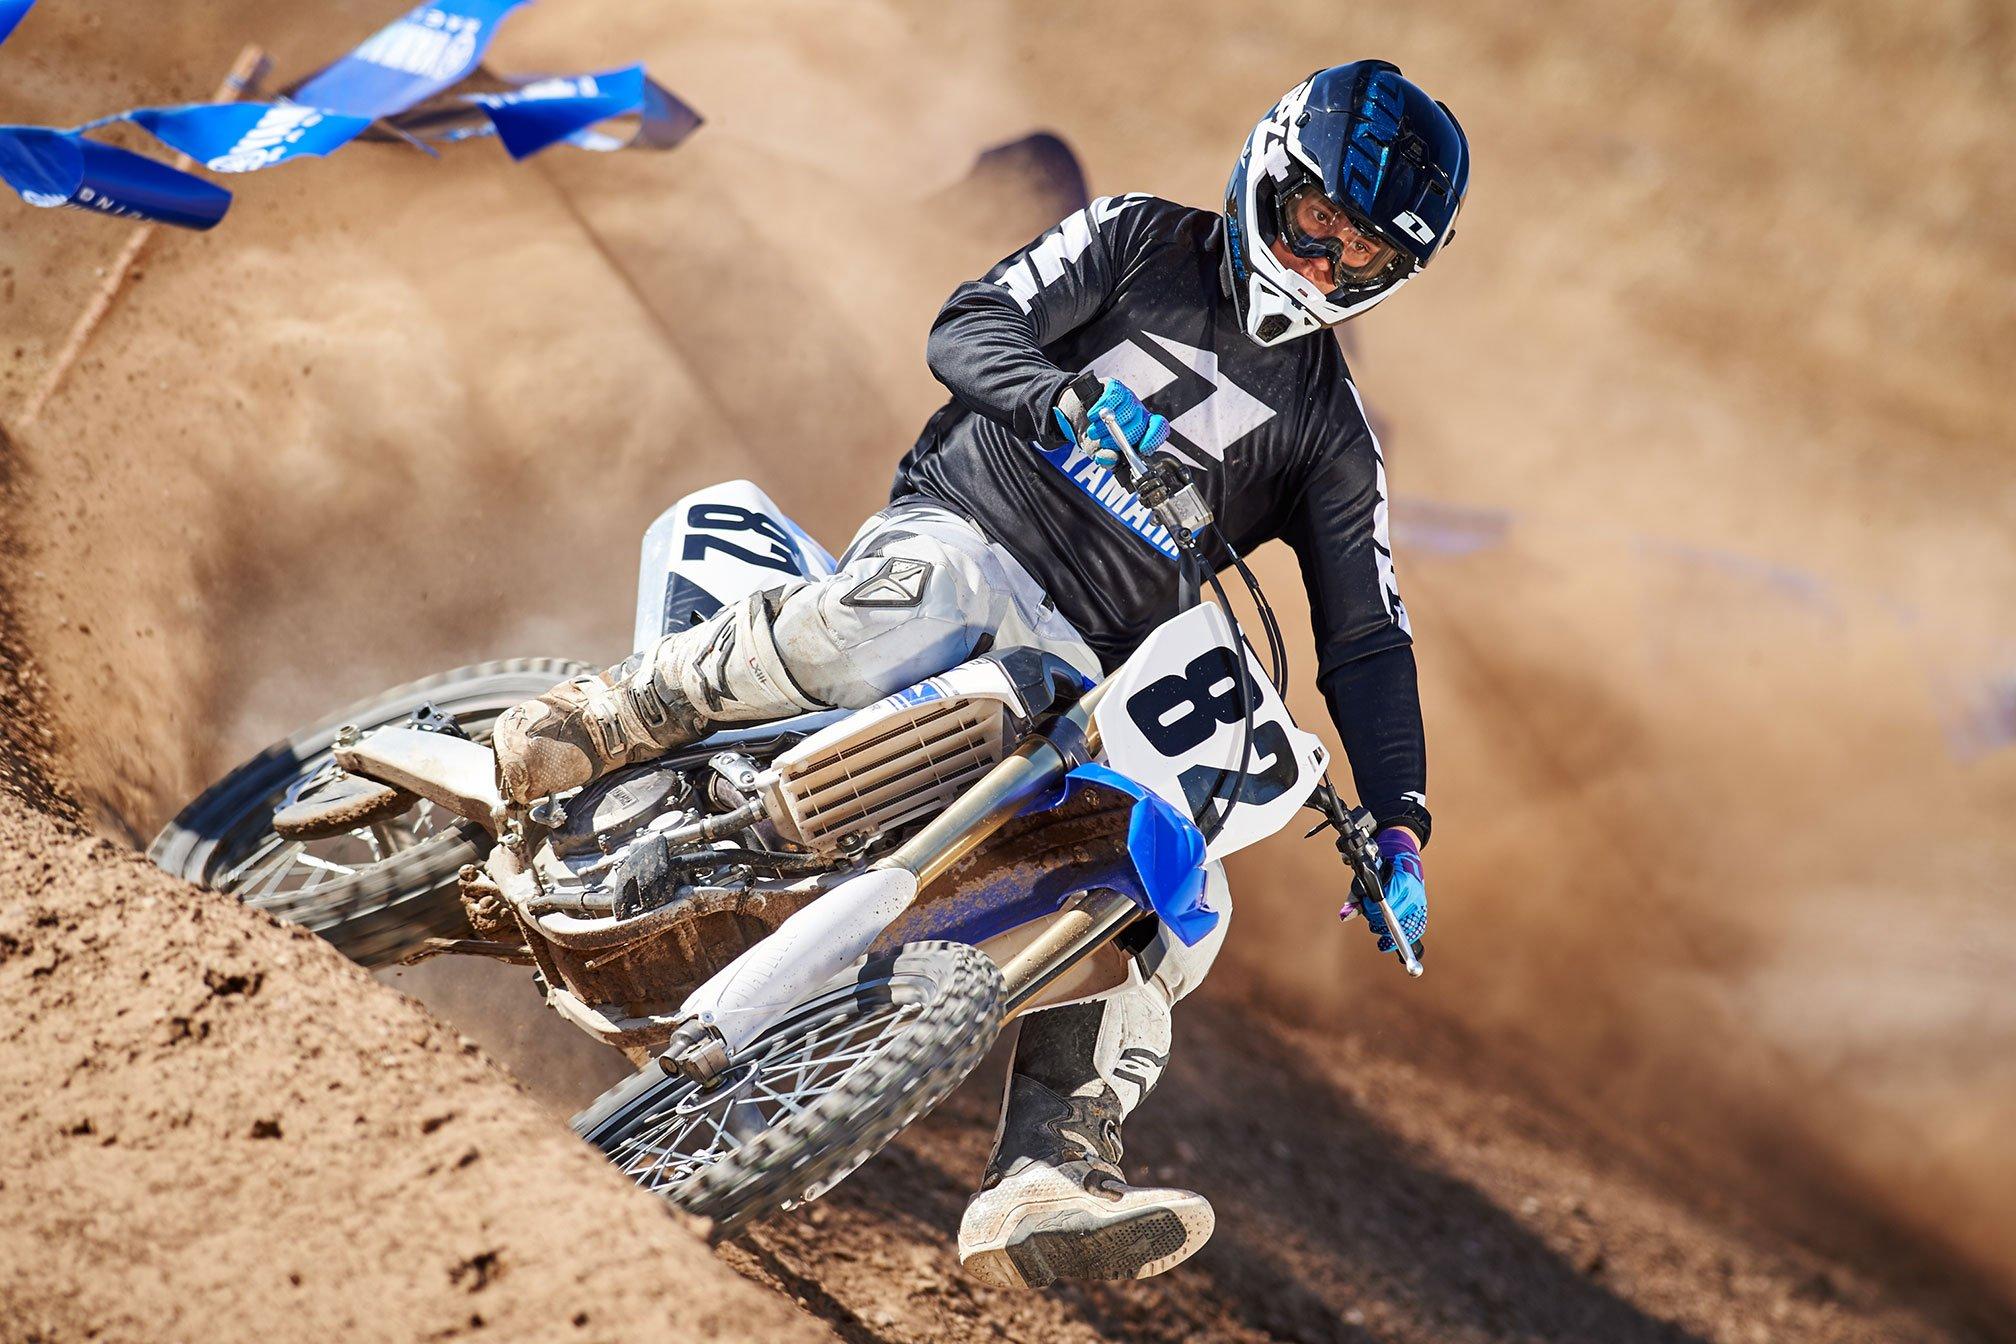 Yamaha Yz450f Dirt Motorcycle Wallpaper Hd Desktop: 2016 Yamaha YZ450F Bike Motorbike Motorcycle Dirtbike